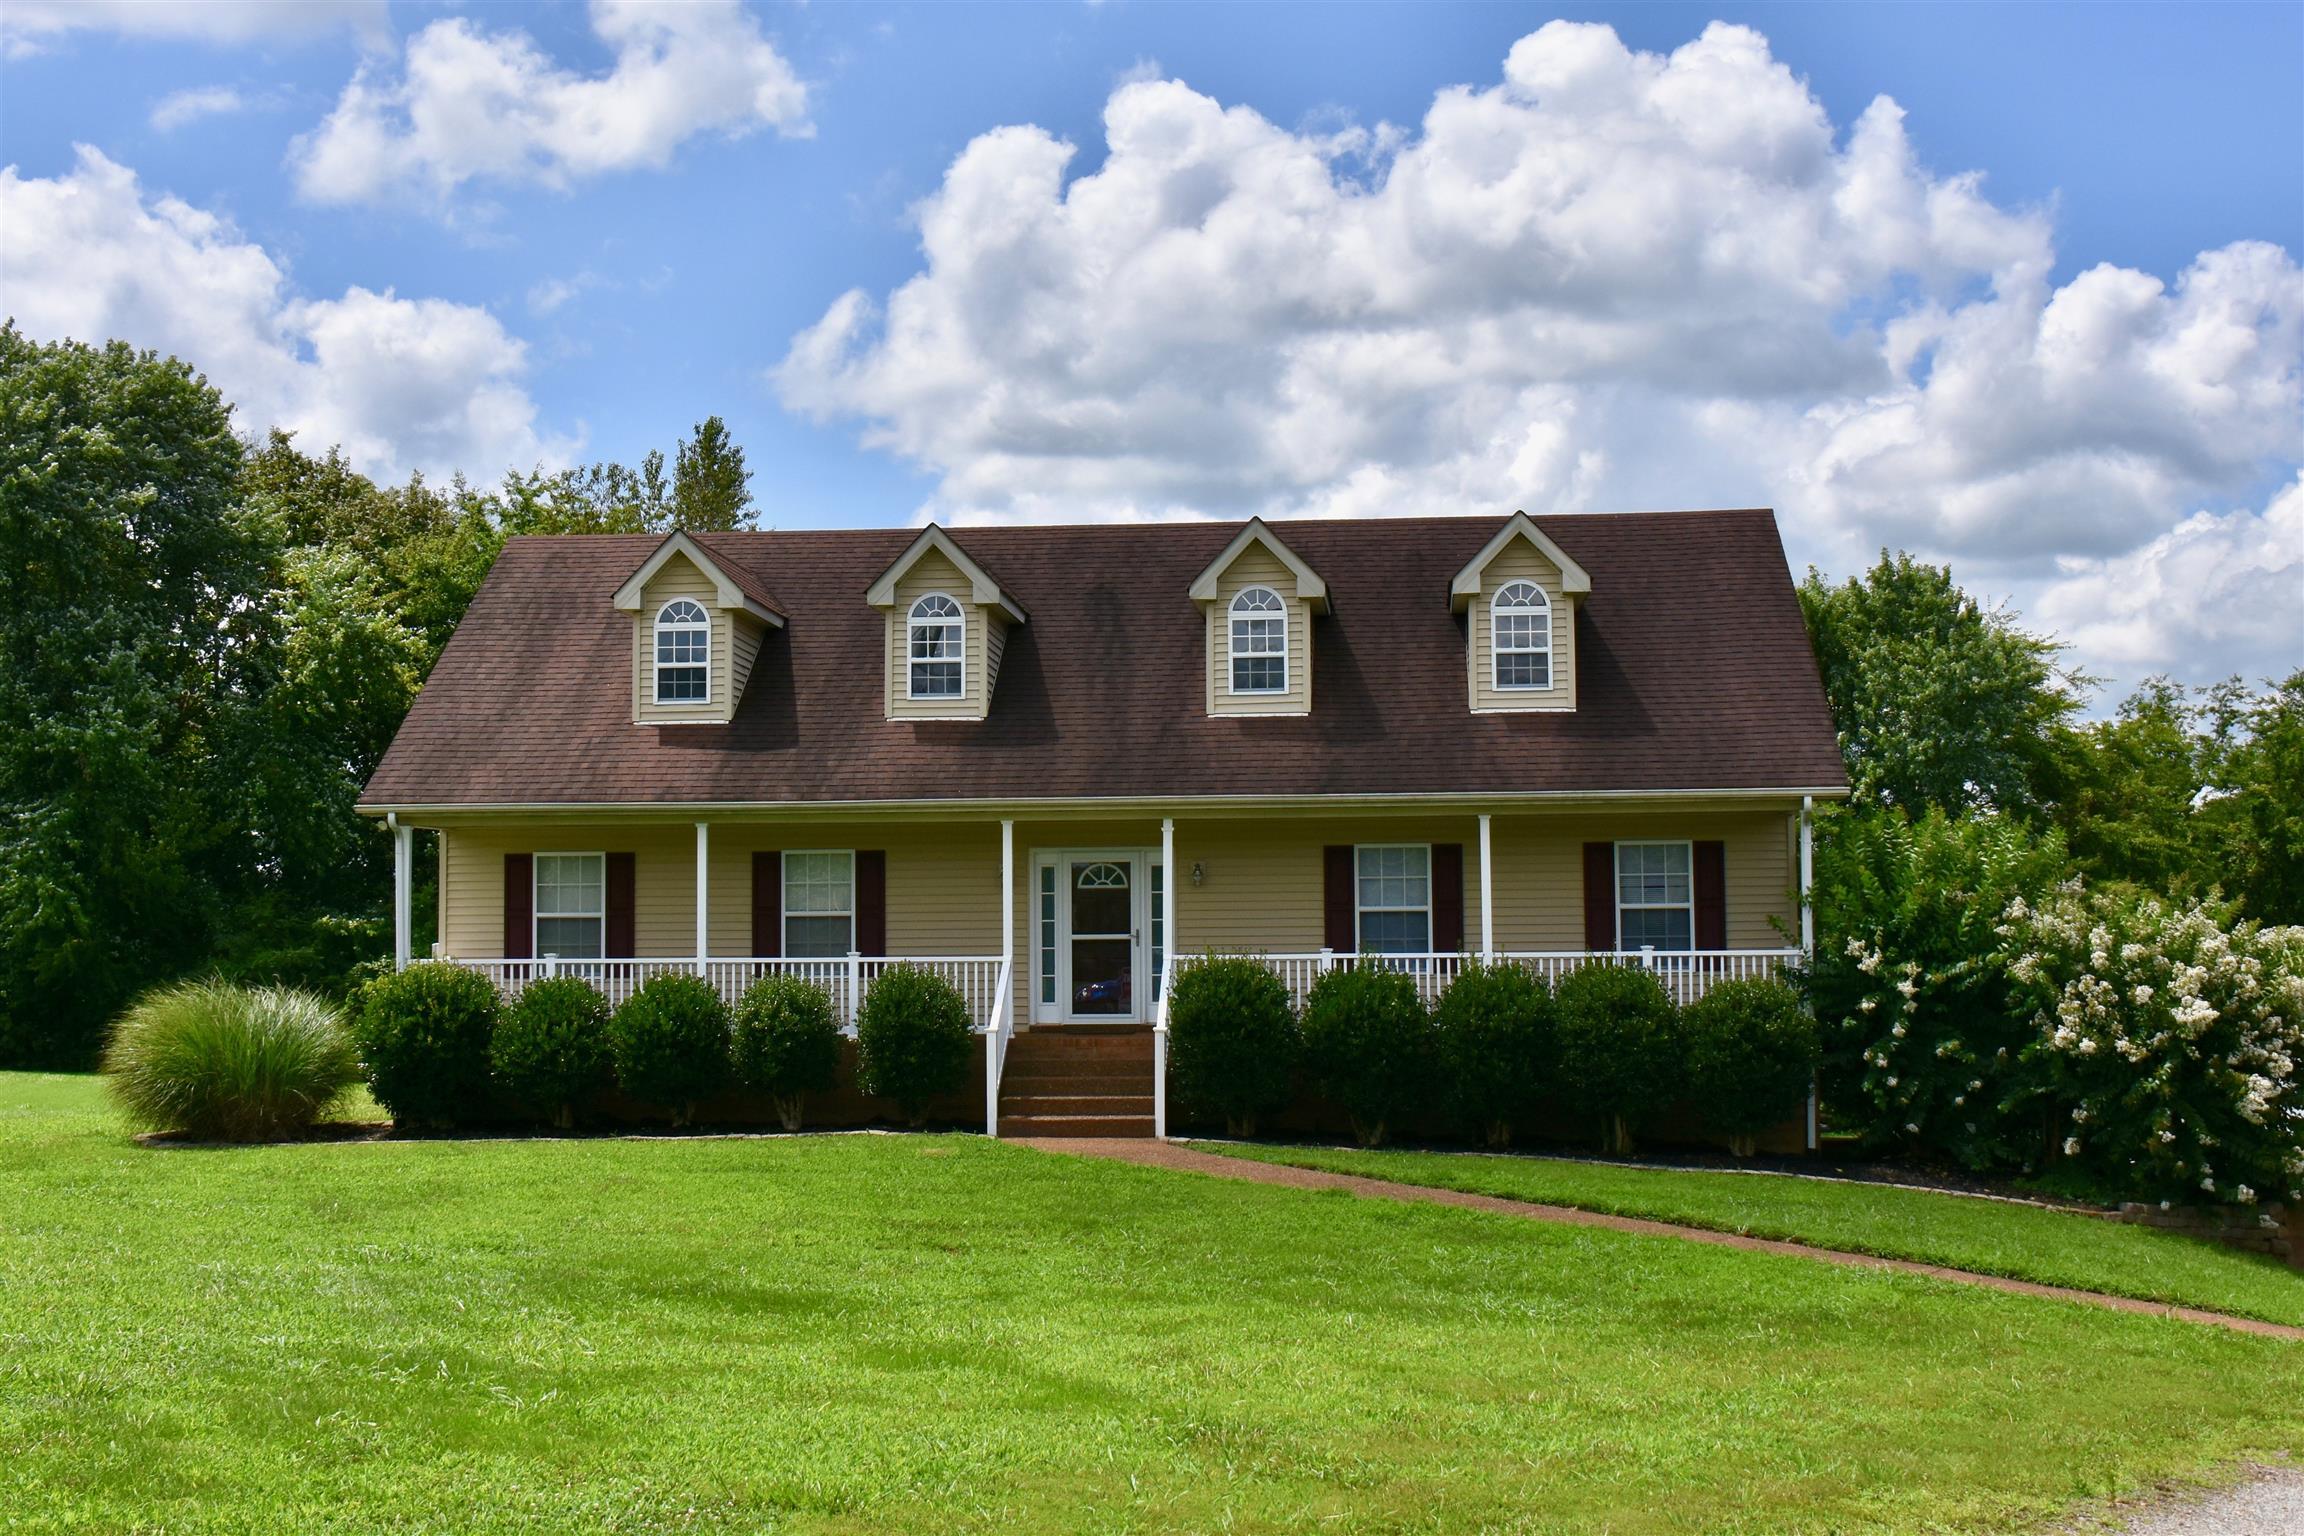 1035 Marilee Court, Orlinda, TN 37141 - Orlinda, TN real estate listing